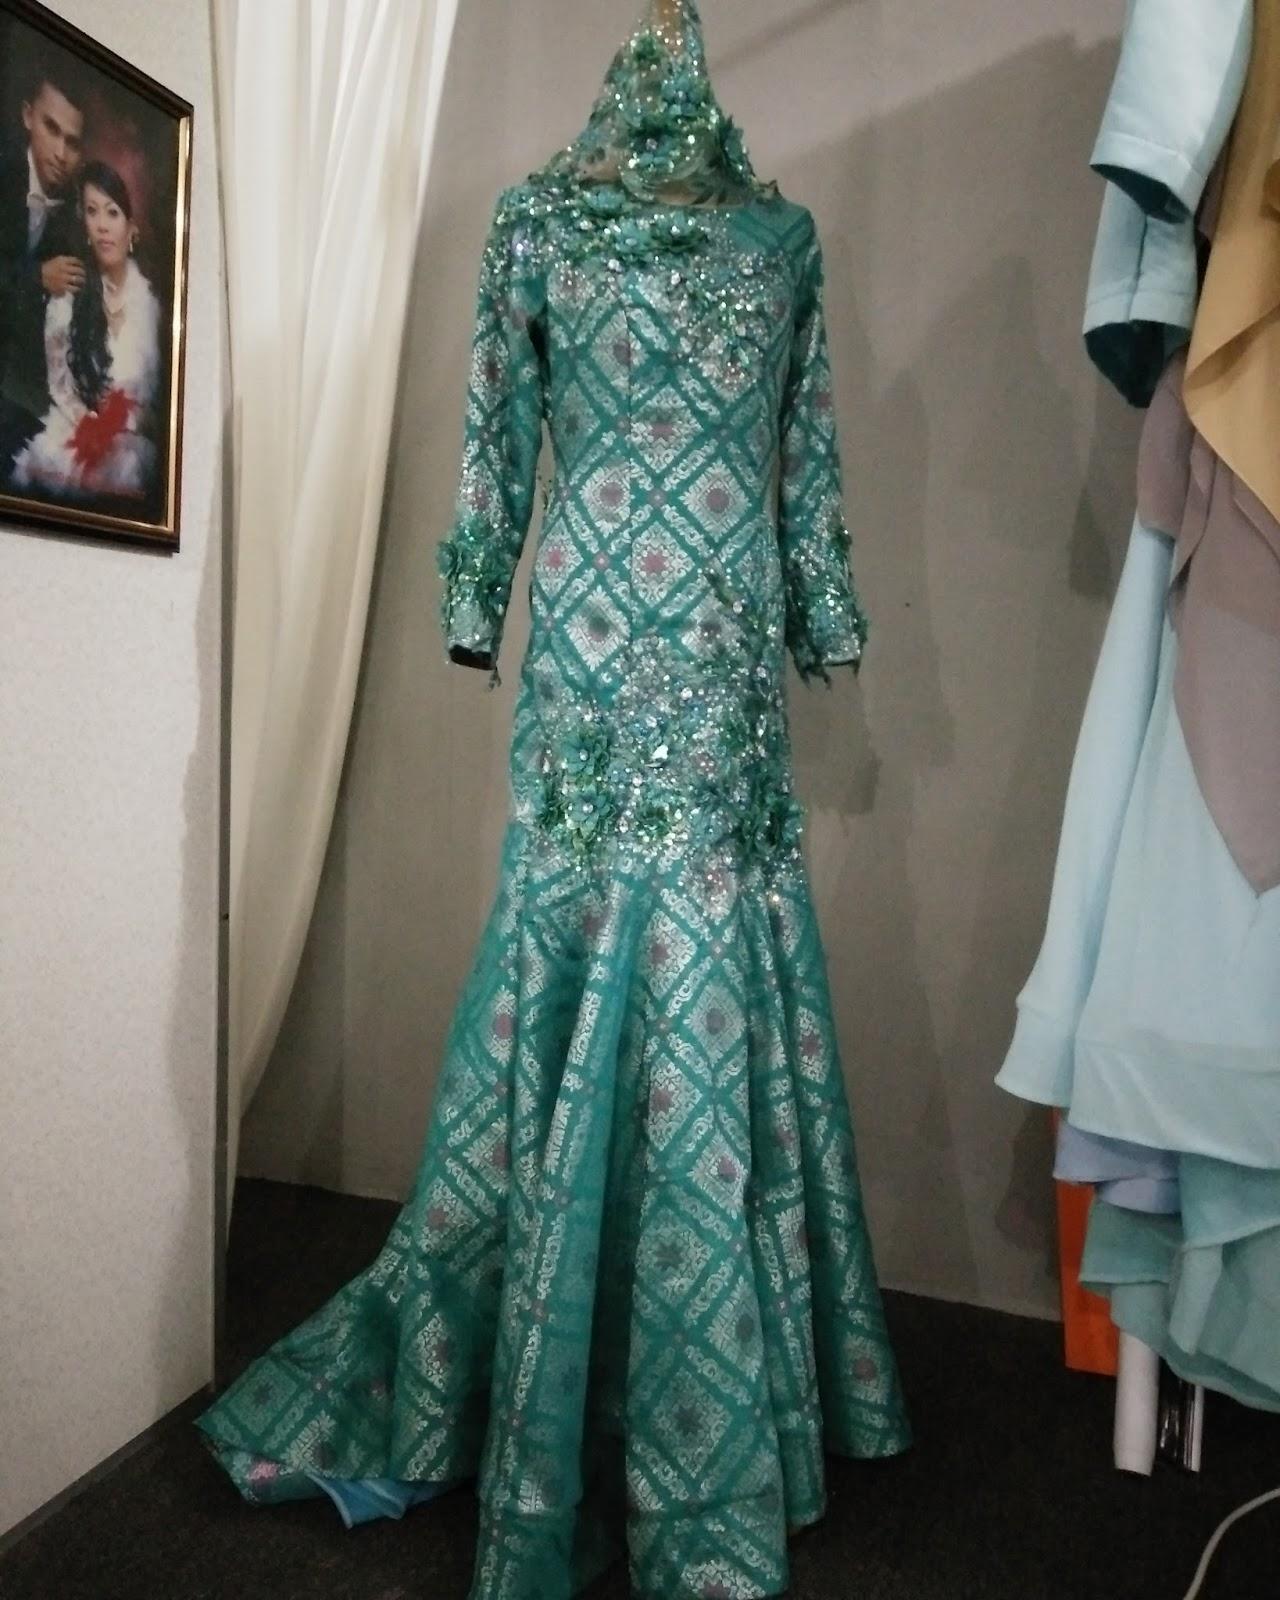 Koleksi Baju Songket Pengantin Terbaru Gaun Pengantin